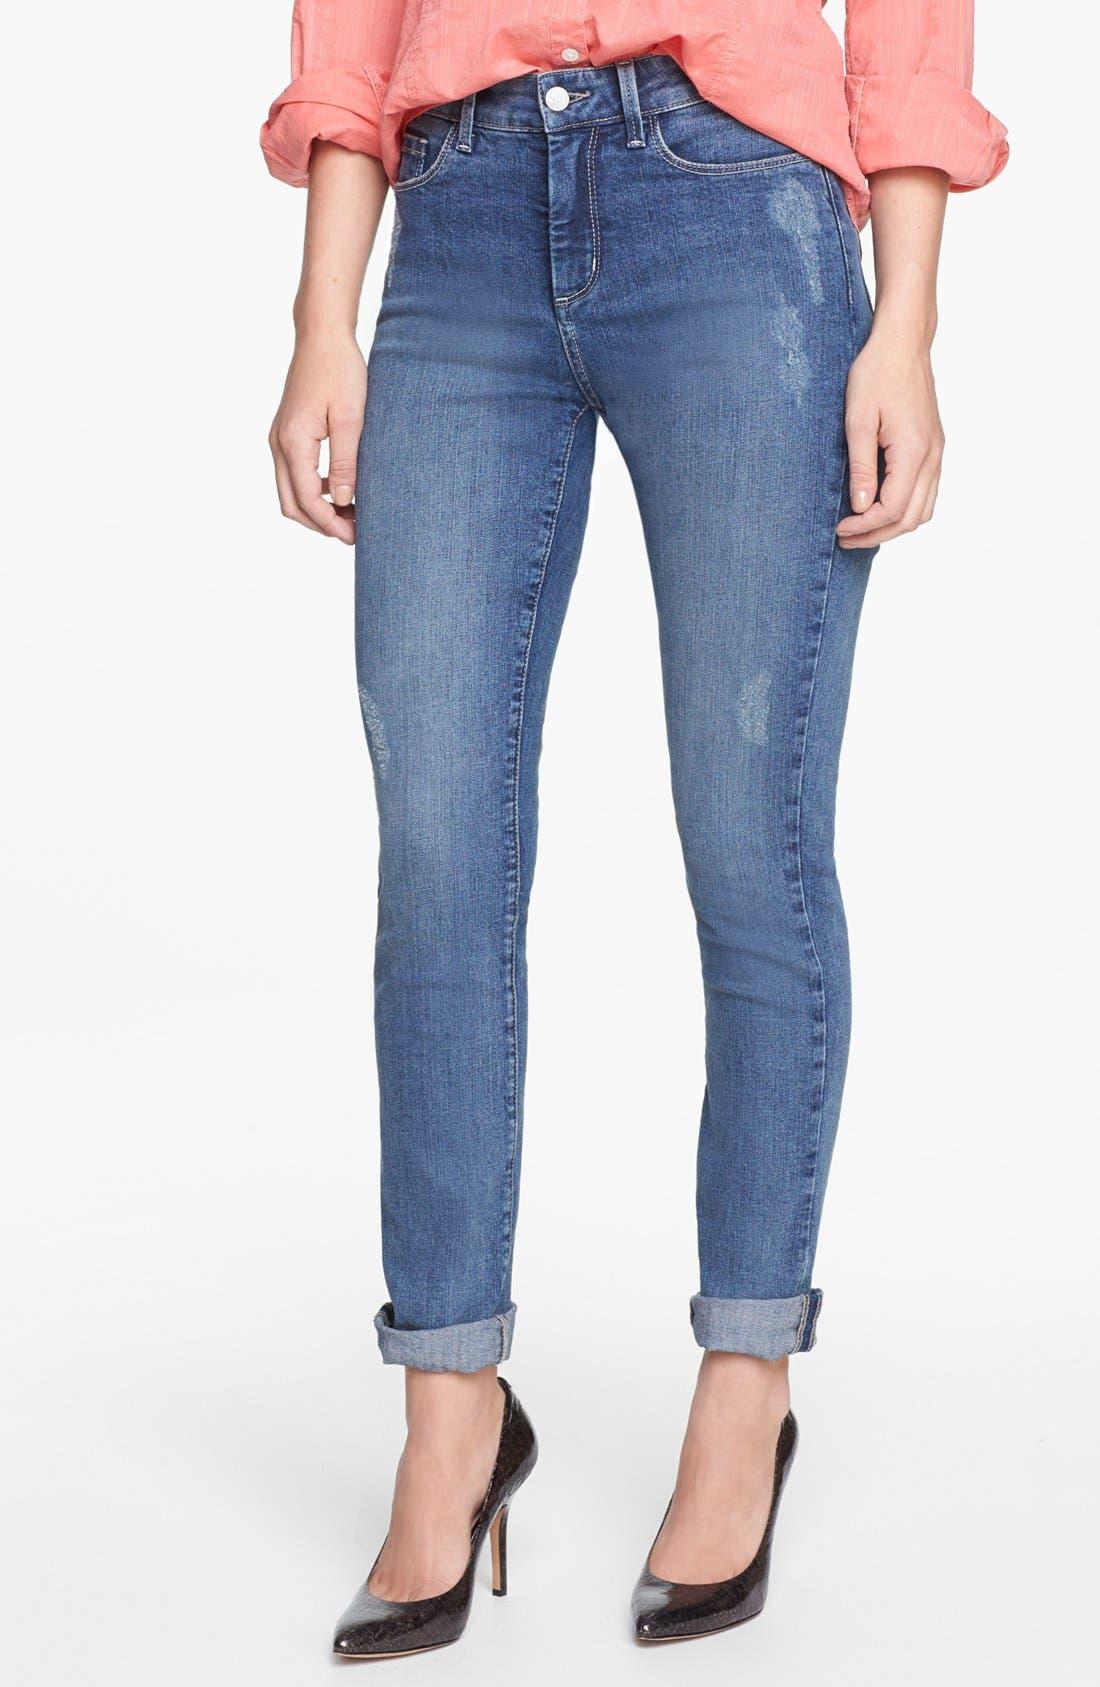 Alternate Image 1 Selected - NYDJ 'Leann' Stretch Skinny Boyfriend Jeans (Lake Arrowhead) (Regular & Petite)